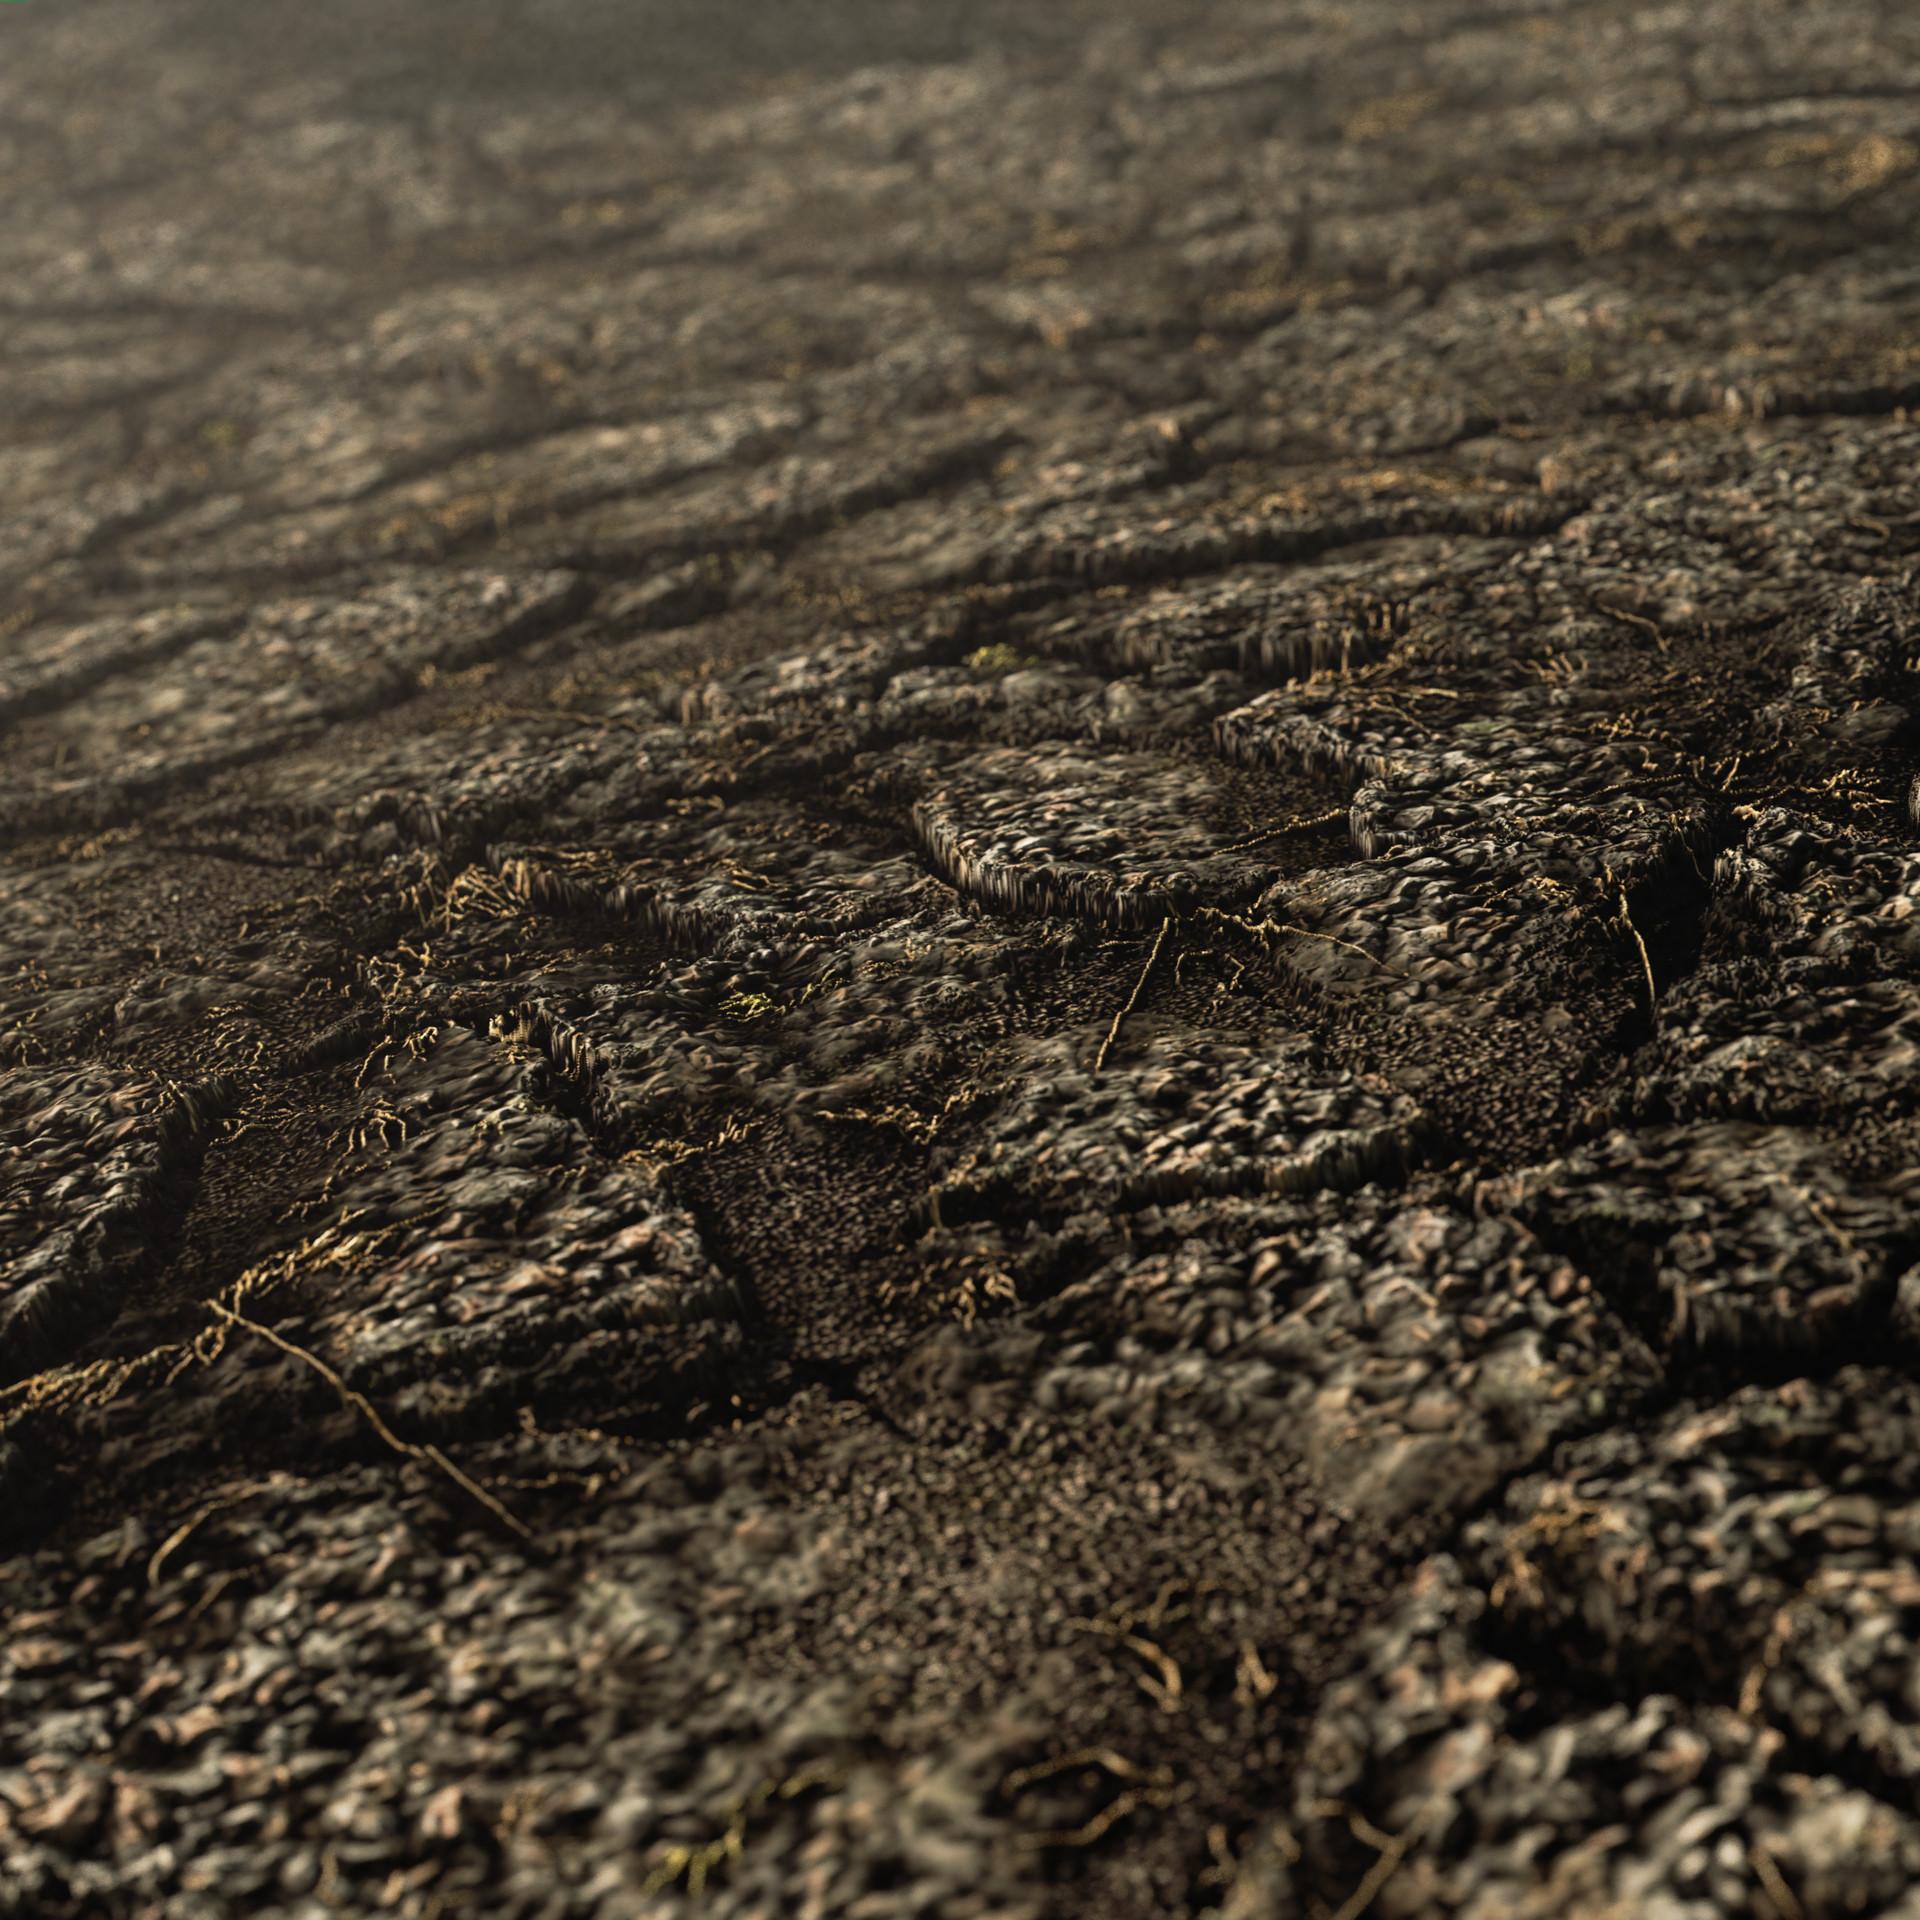 Cem tezcan hard soil ground 00002 beauty